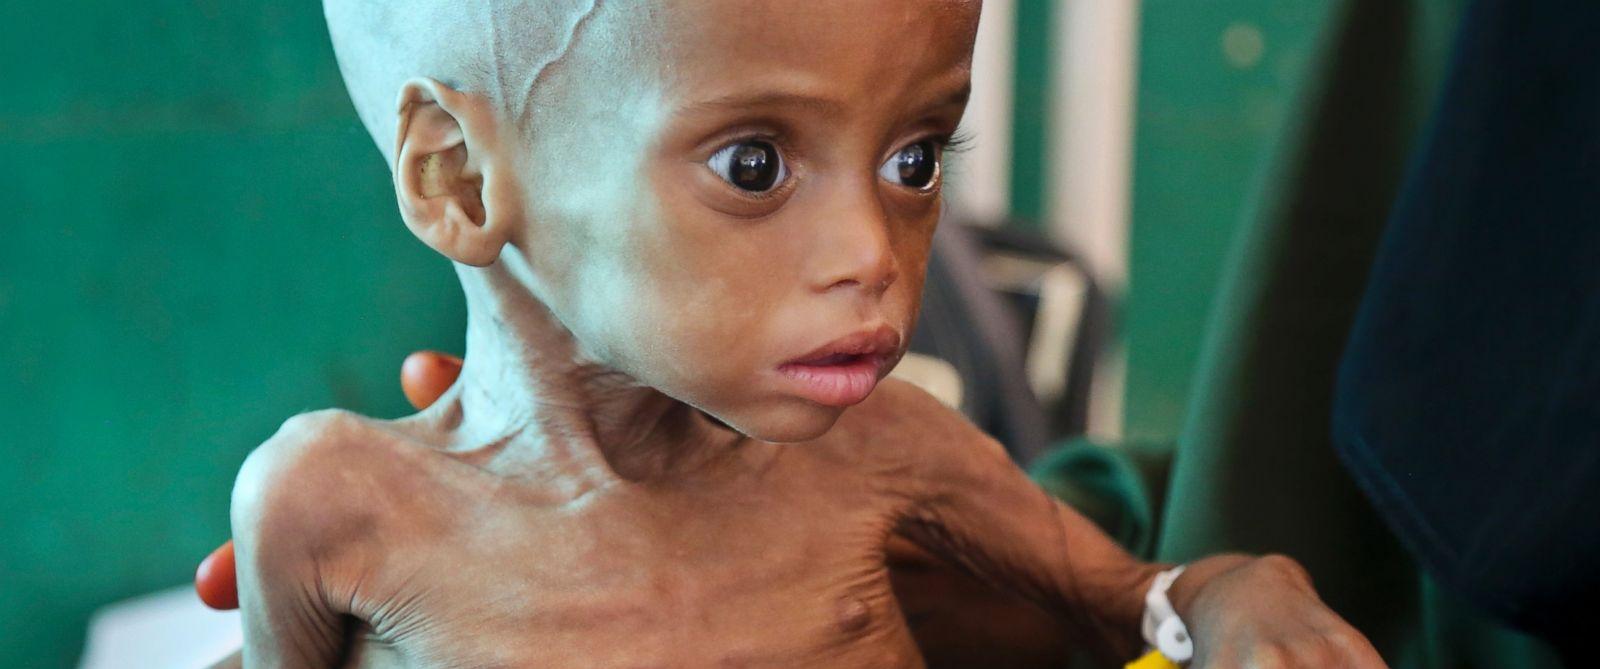 PHOTO: A malnourished child is treated at the Banadir Hospital in Mogadishu, Somalia, on March 11, 2017.